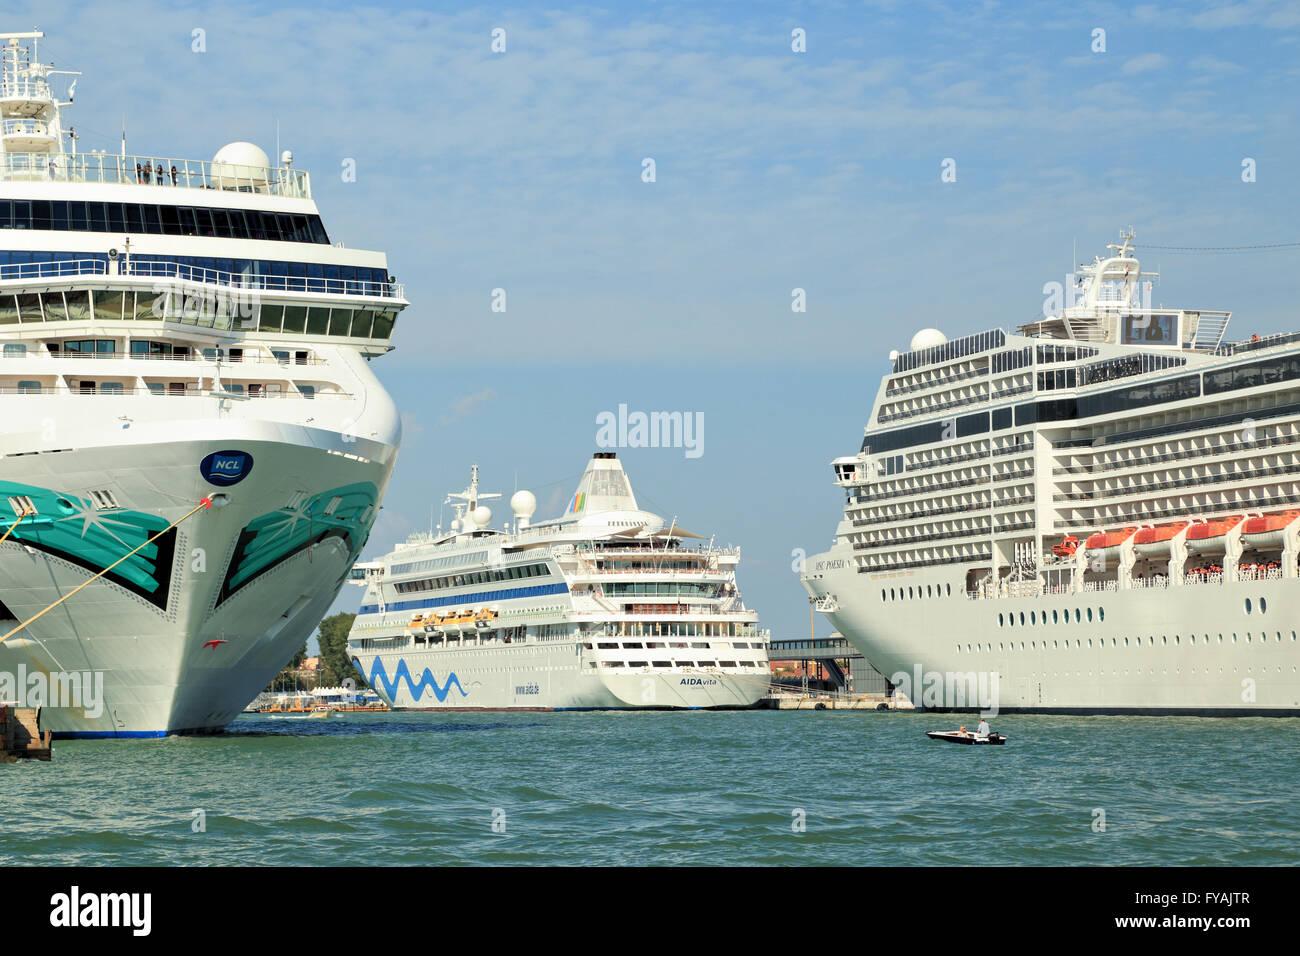 Cruise ships Norwegian Jade, AIDAvita, and MSC Poesia in the port of Venice - Stock Image